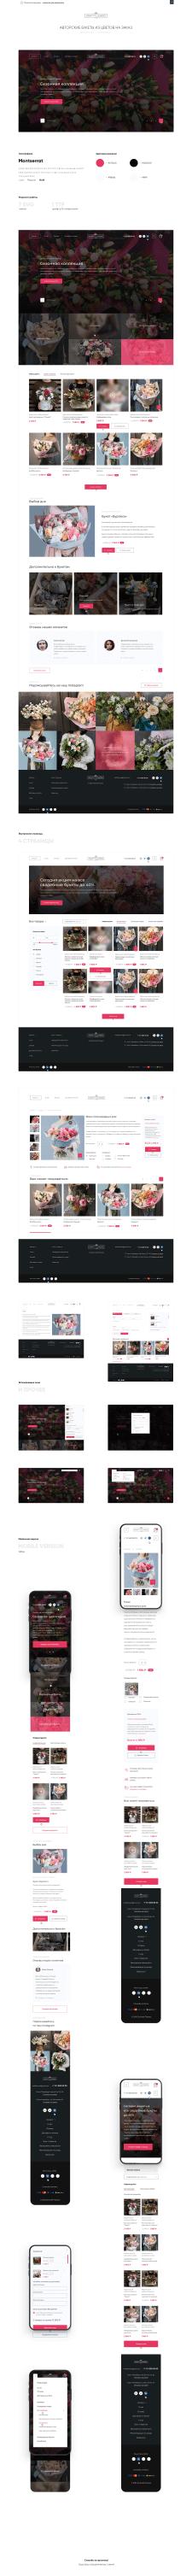 Дизайн интернет-магазина – Доставка цветов